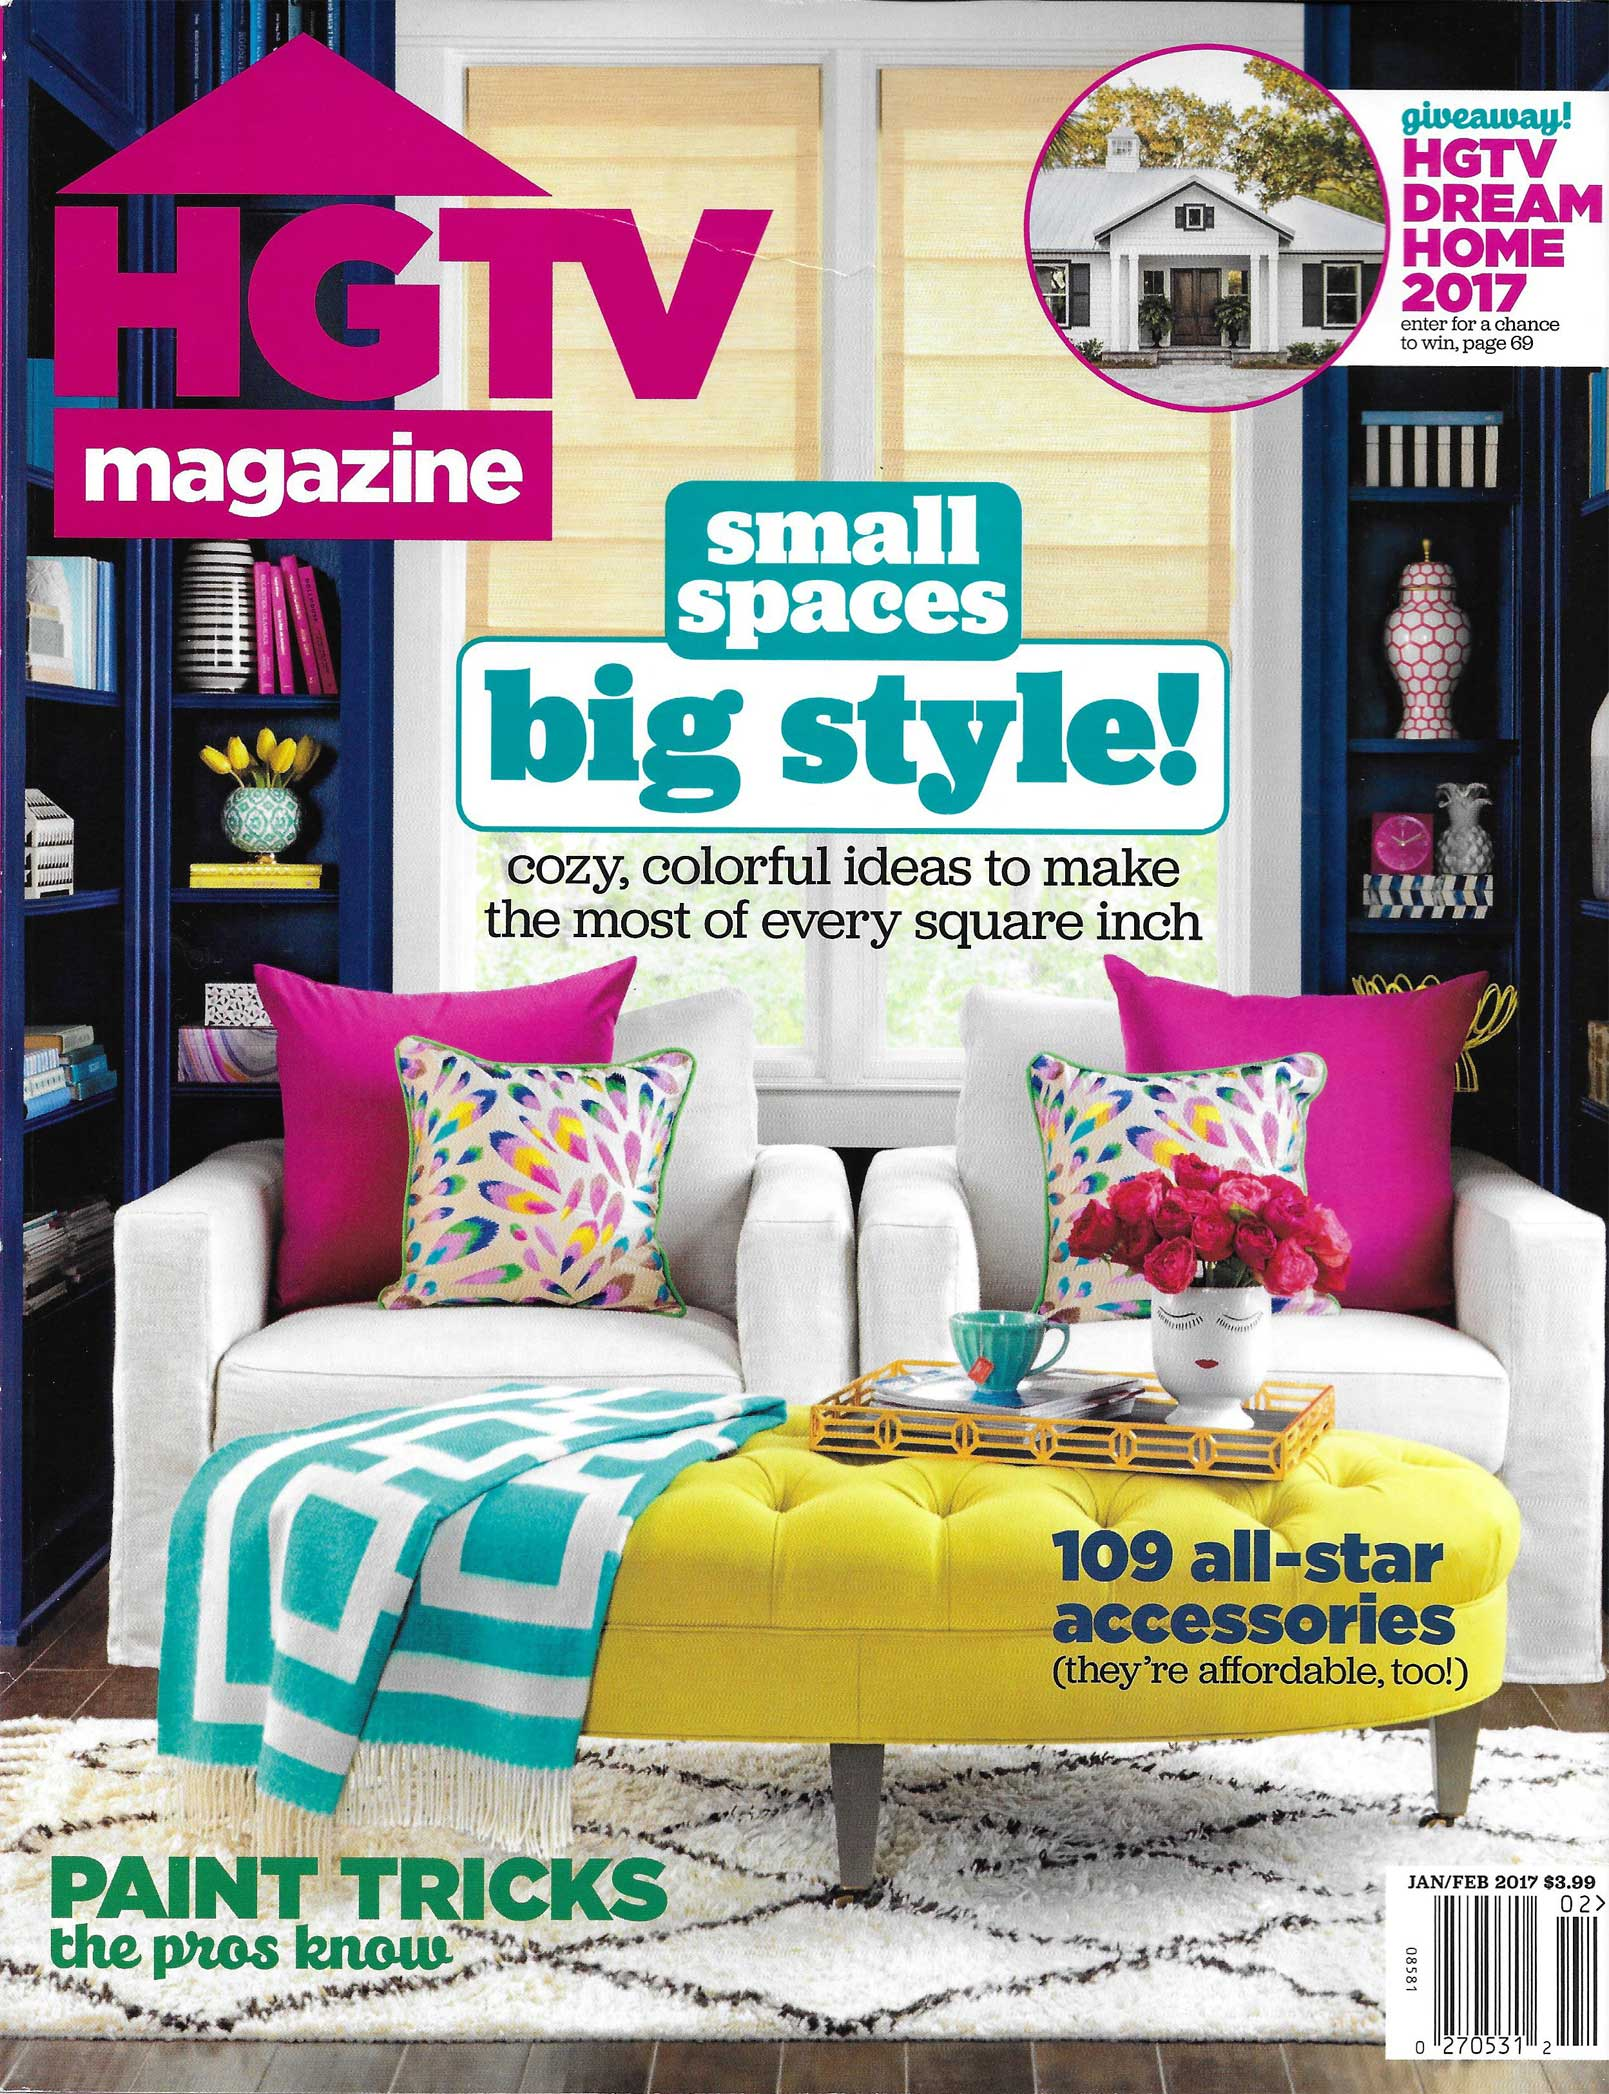 HGTV, 1 of 2